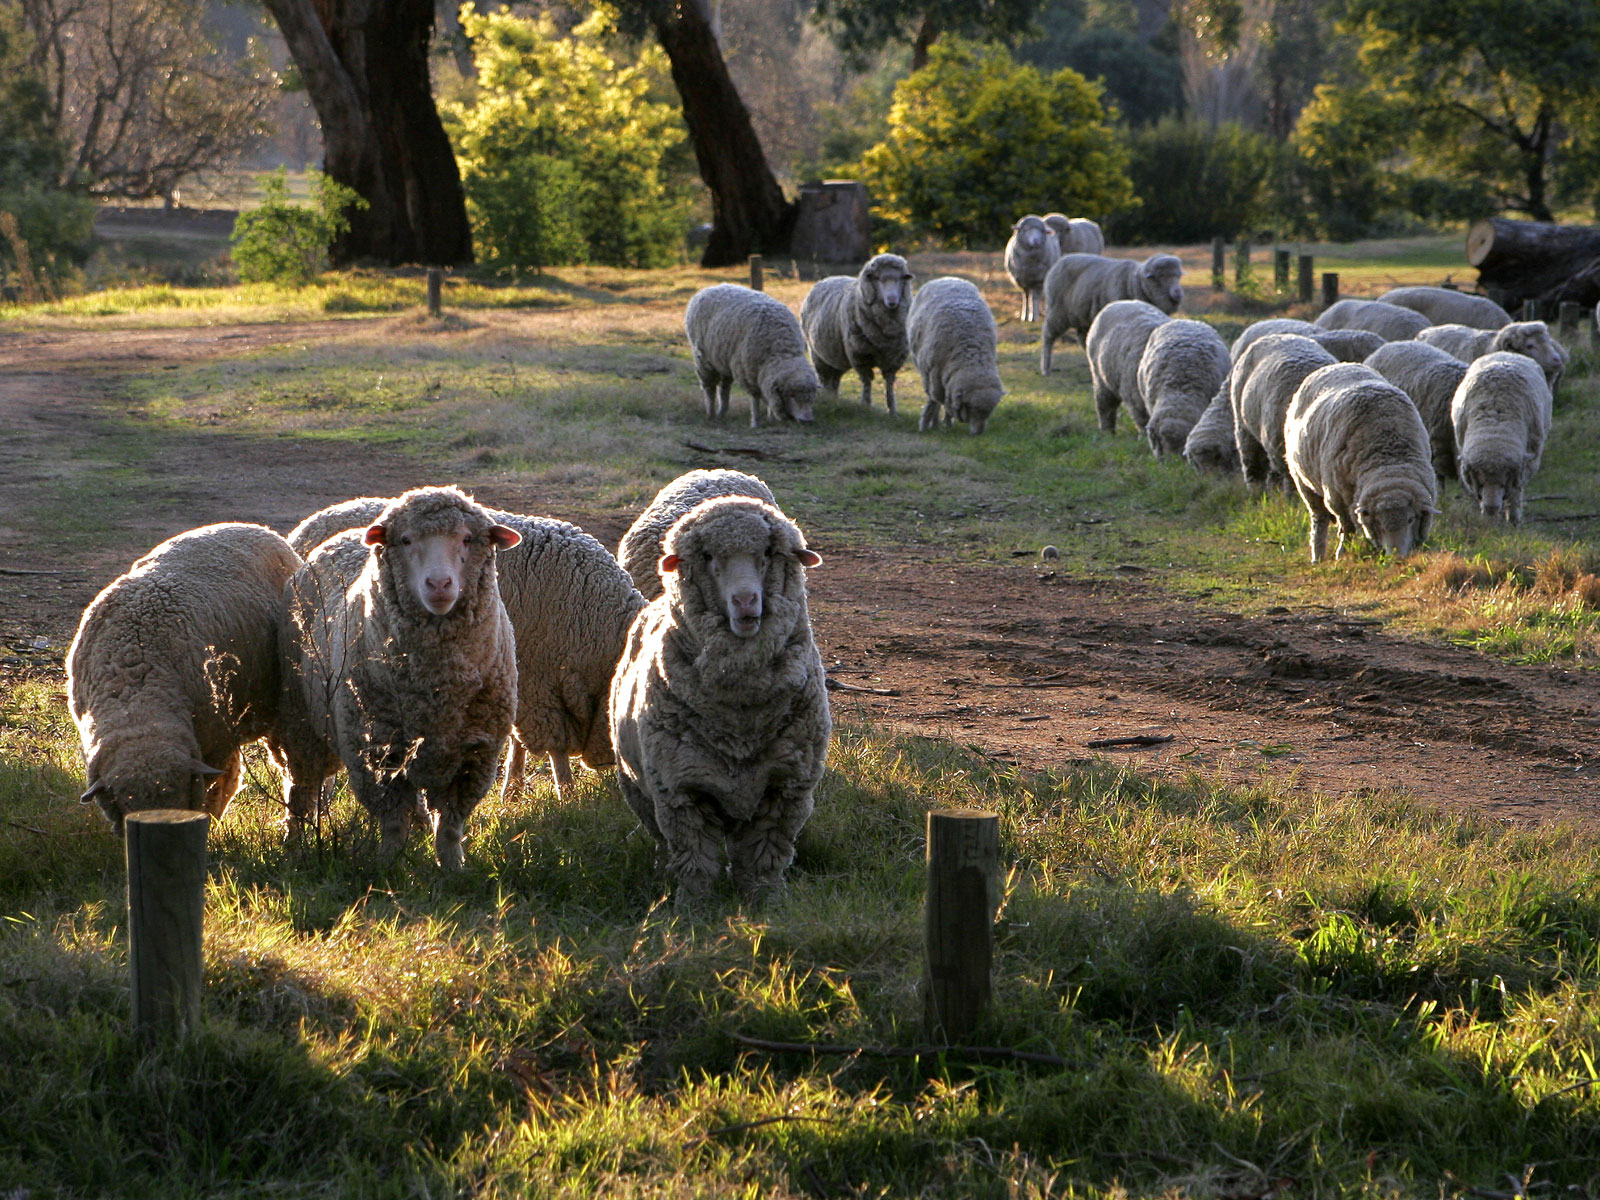 Sheep looking